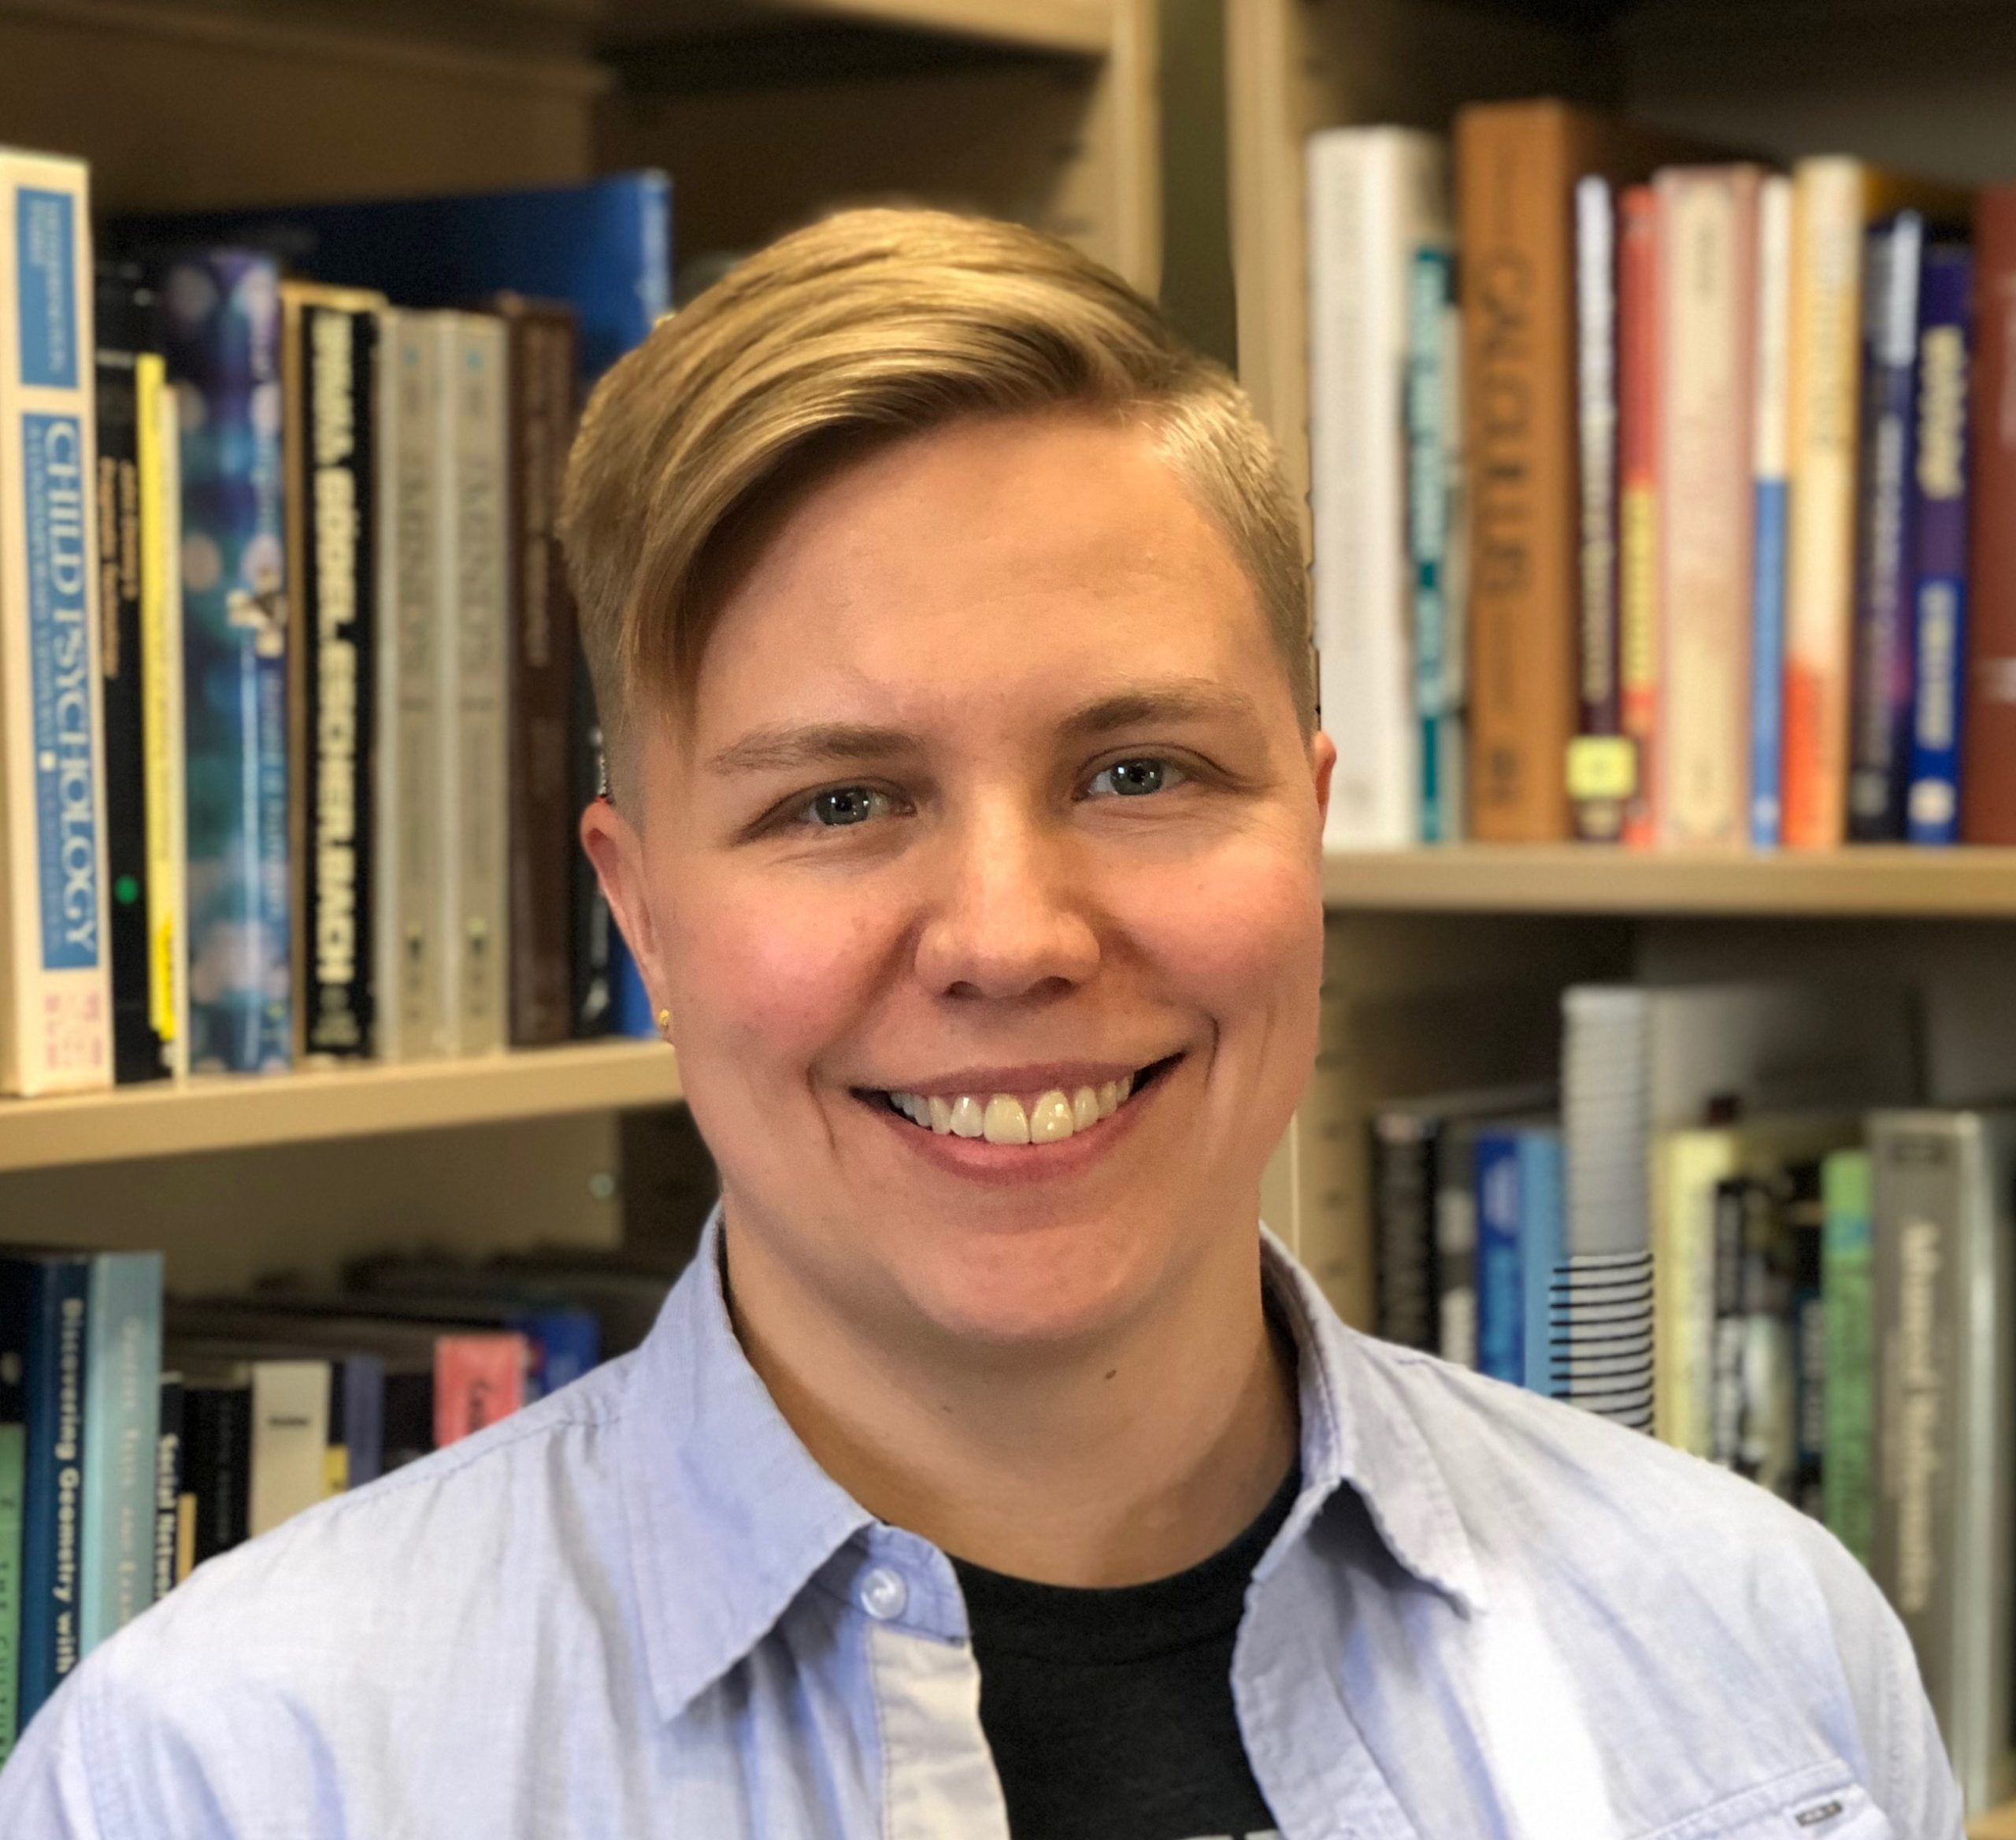 Dr. Amanda Siebert-Evenstone